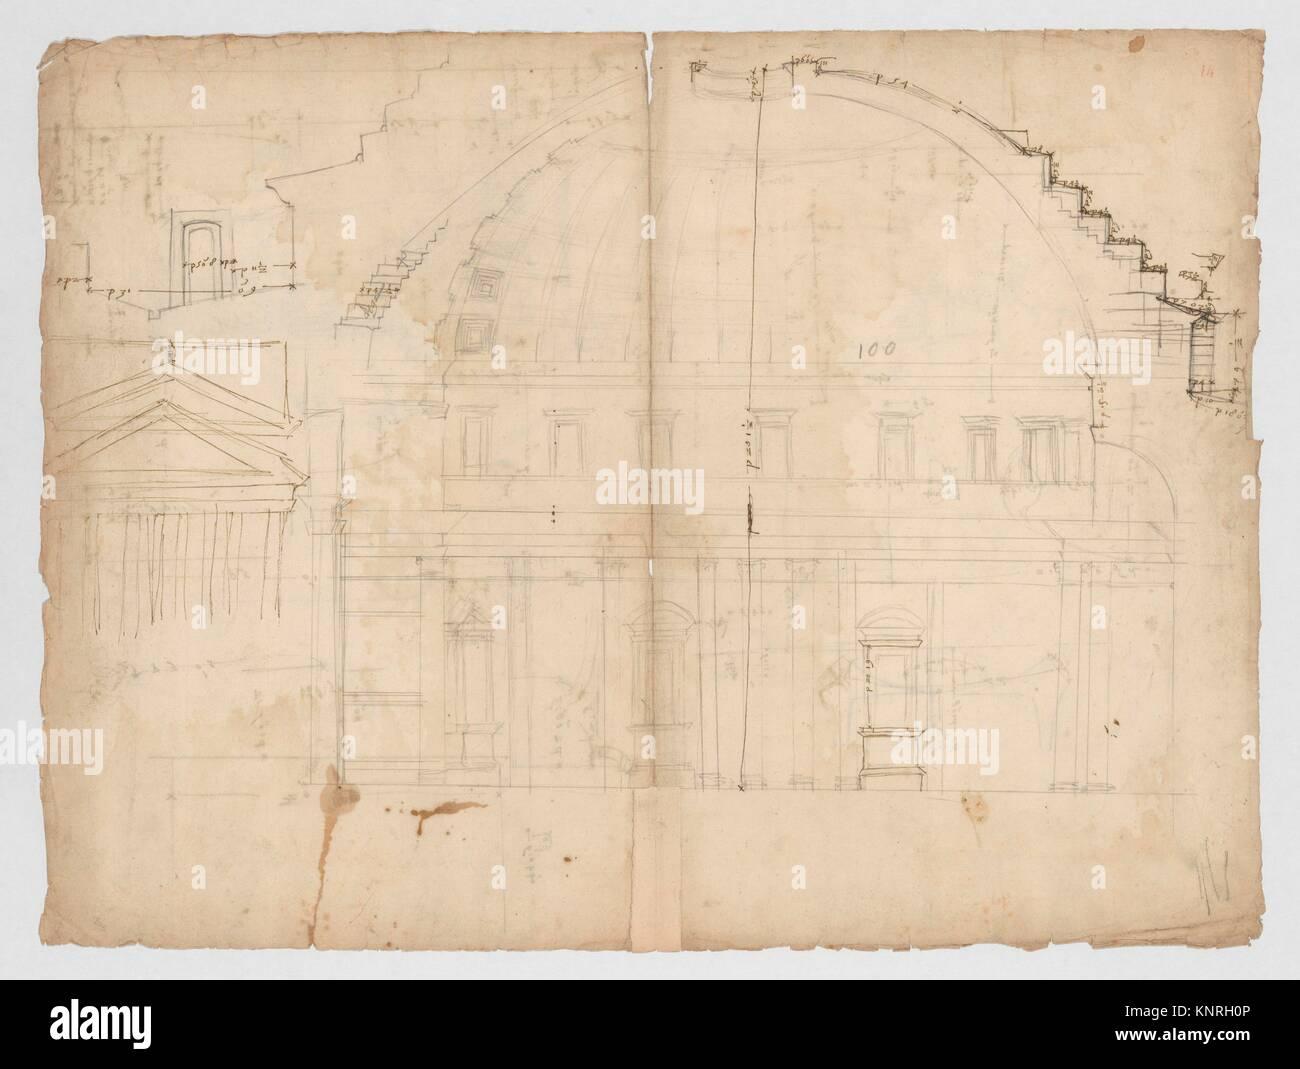 Pantheon, Abschnitt (recto) Pantheon, Kapital, Elevation, Kapital, Details. Serie/Portfolio: Goldschmidt Scrapbook; Stockbild